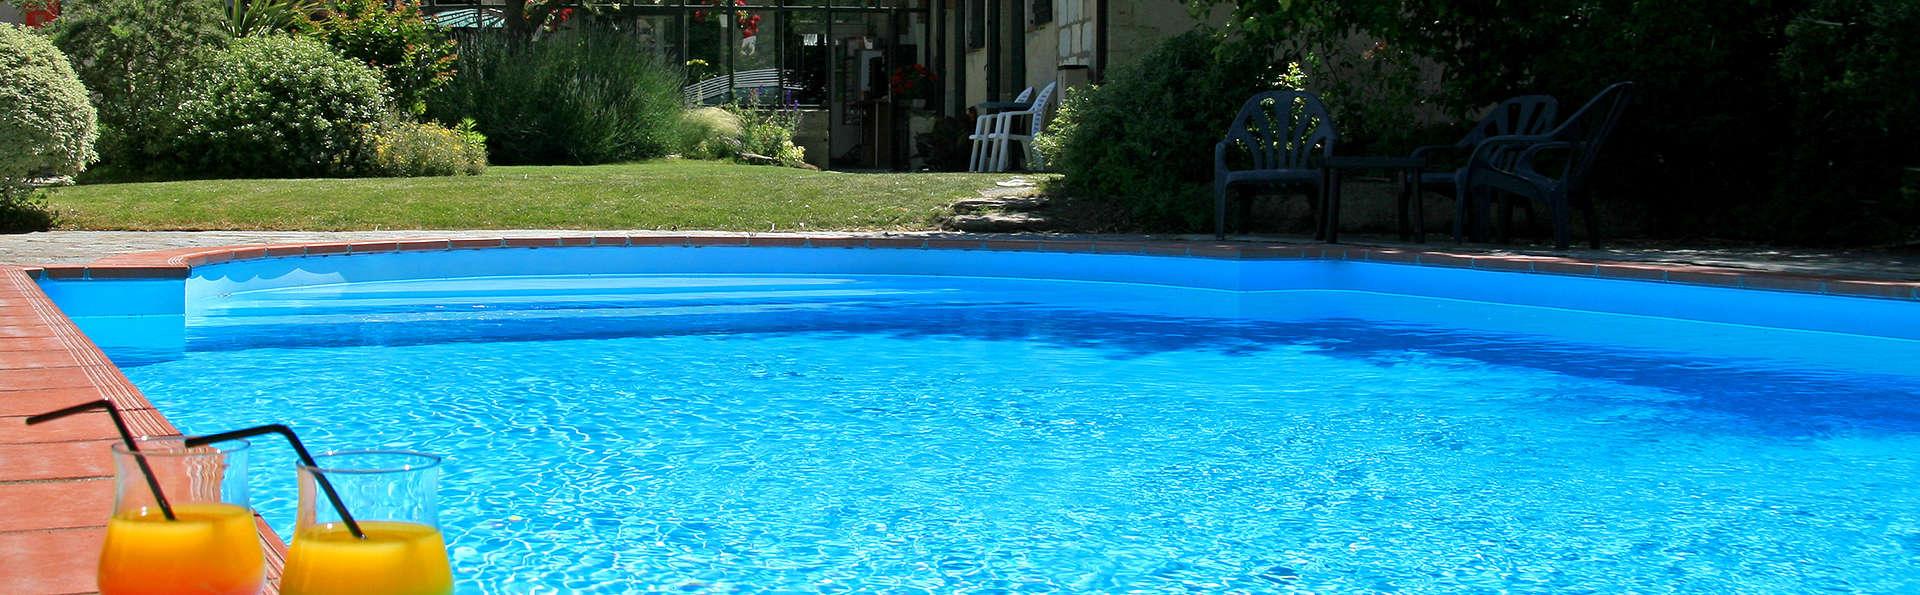 Hotel The Originals Domaine Le Martinet (ex Relais du Silence) - Edit_Pool4.jpg